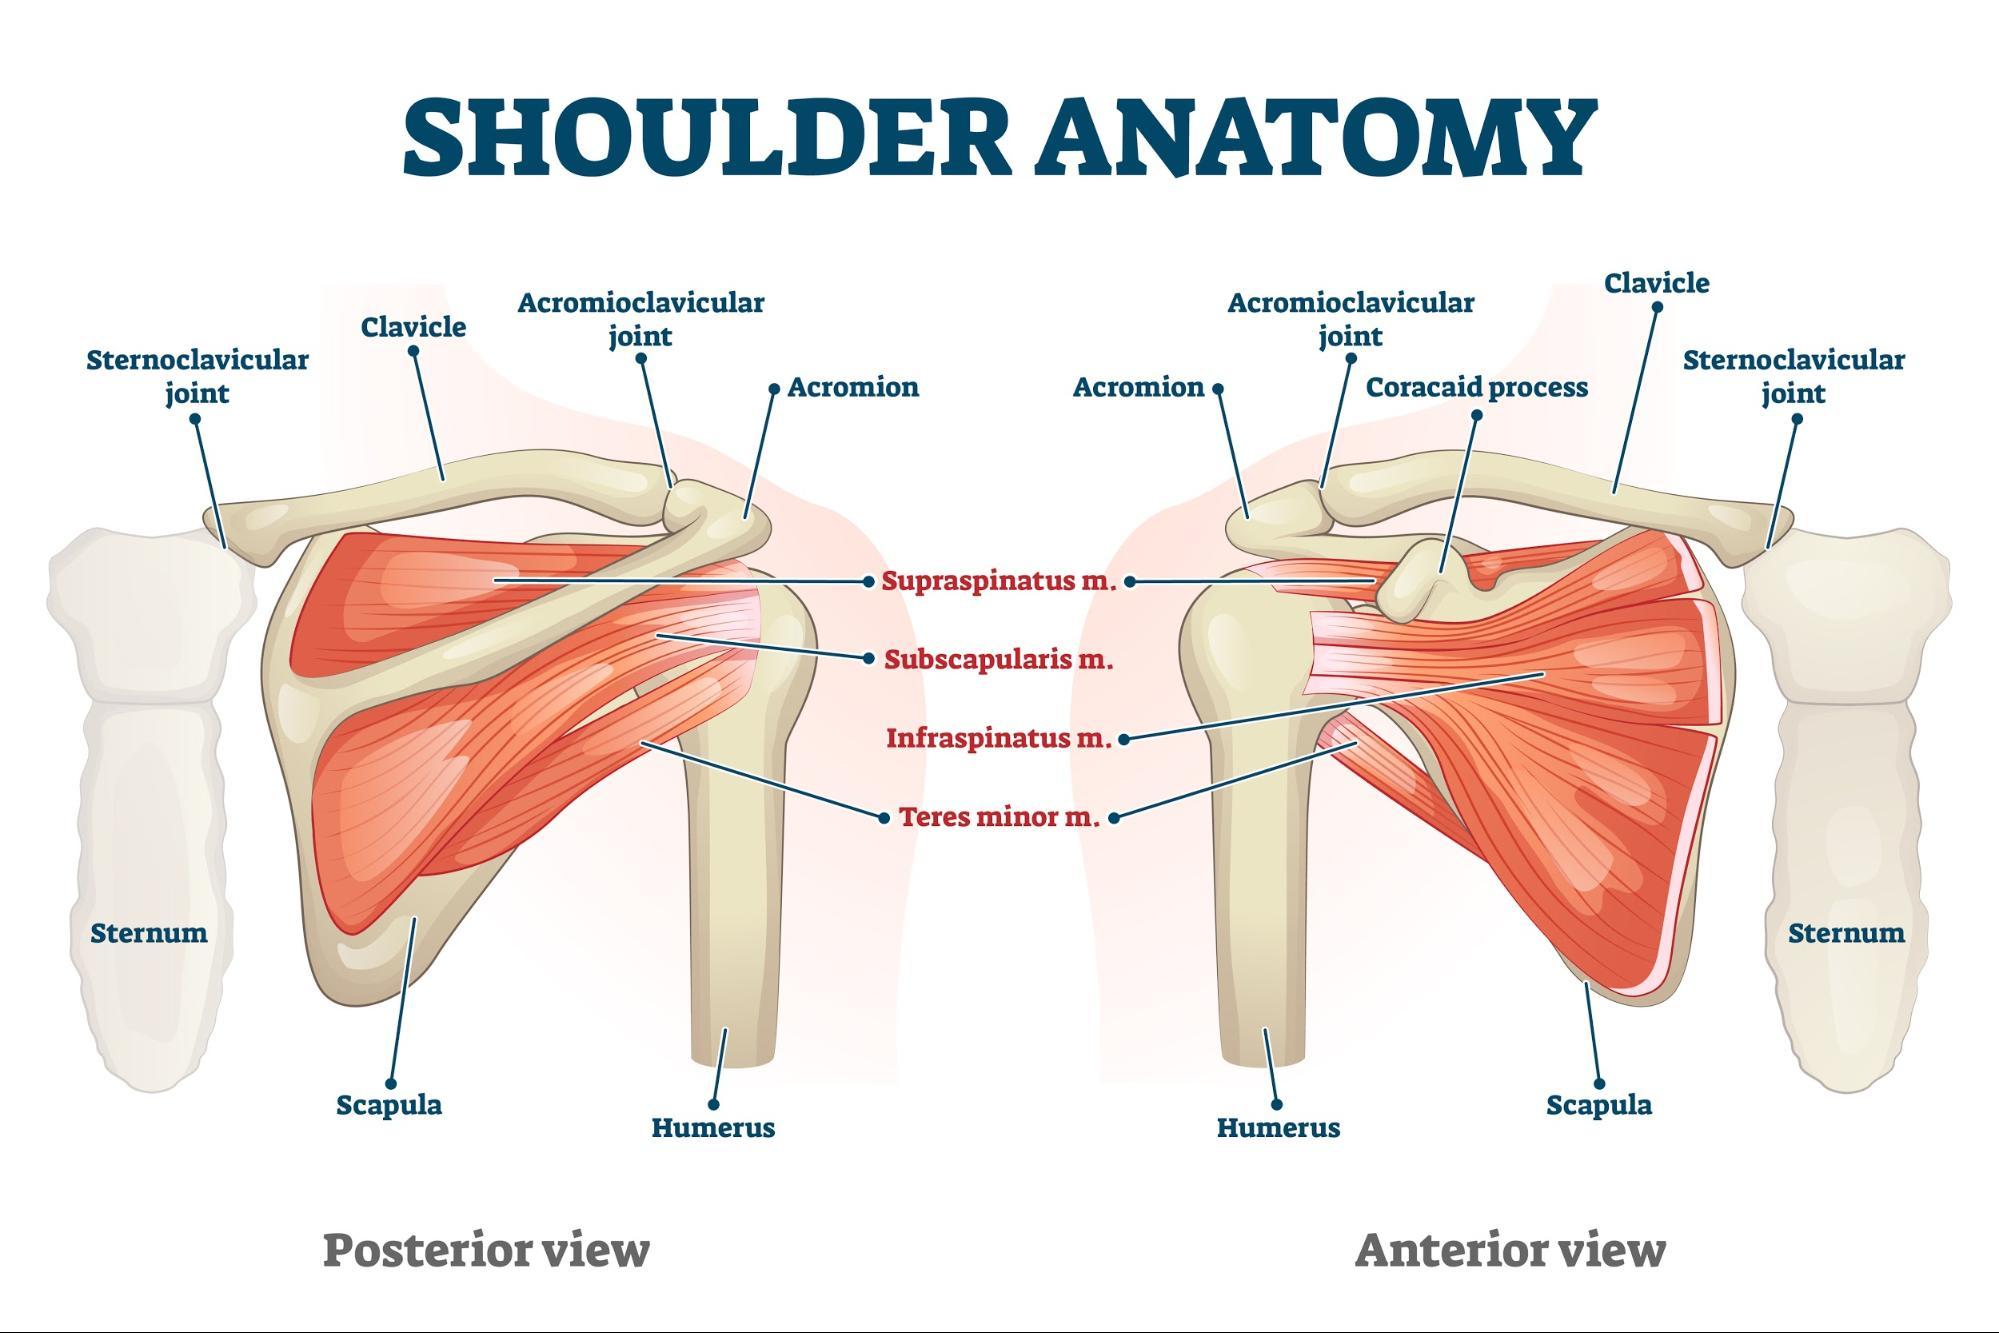 Diagram showing shoulder anatomy